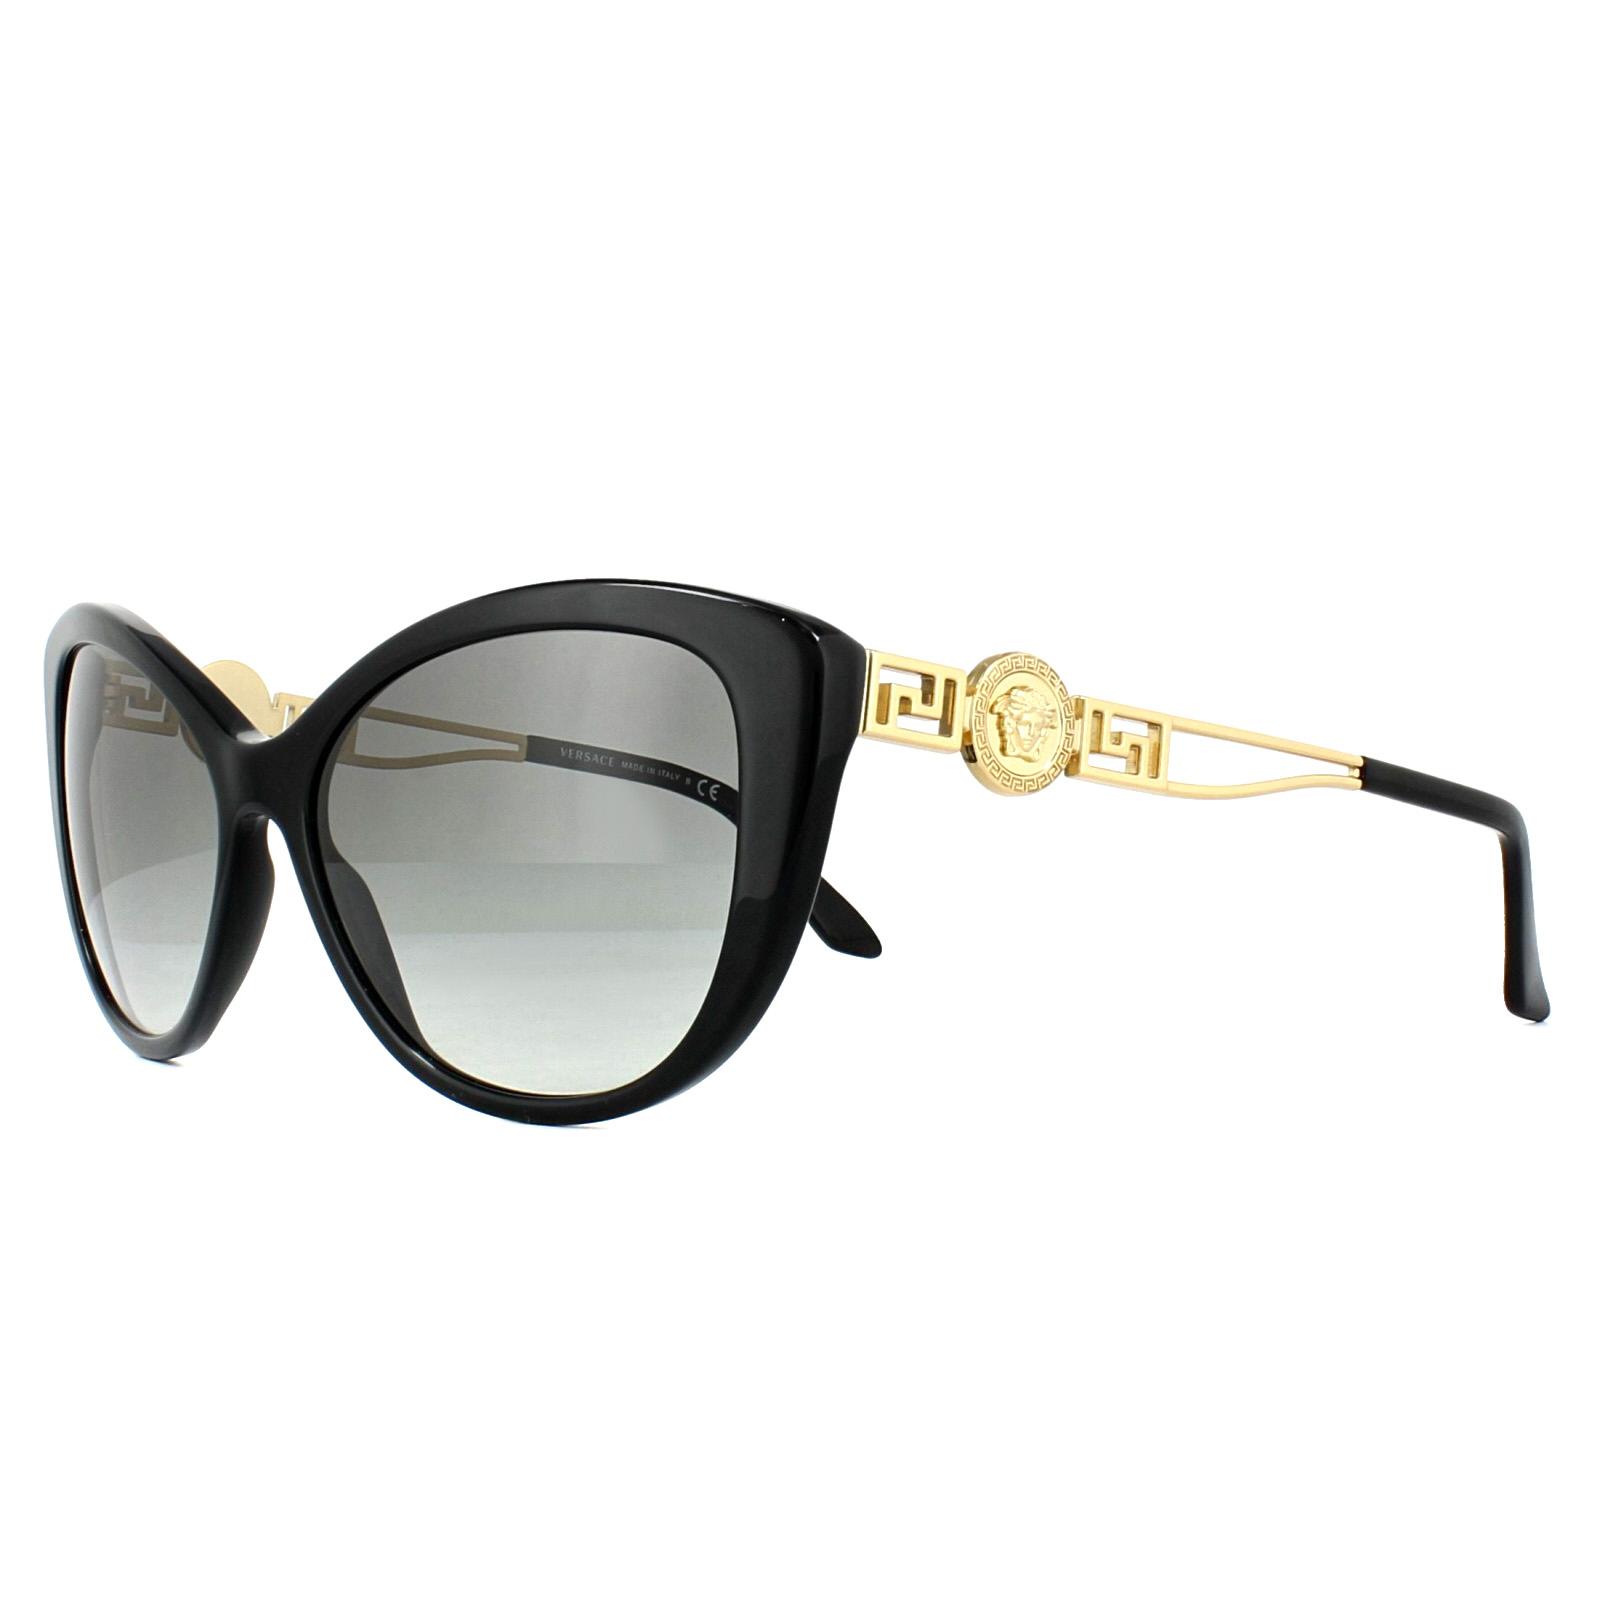 e7c1908cff71 Cheap Versace VE4295 Sunglasses - Discounted Sunglasses